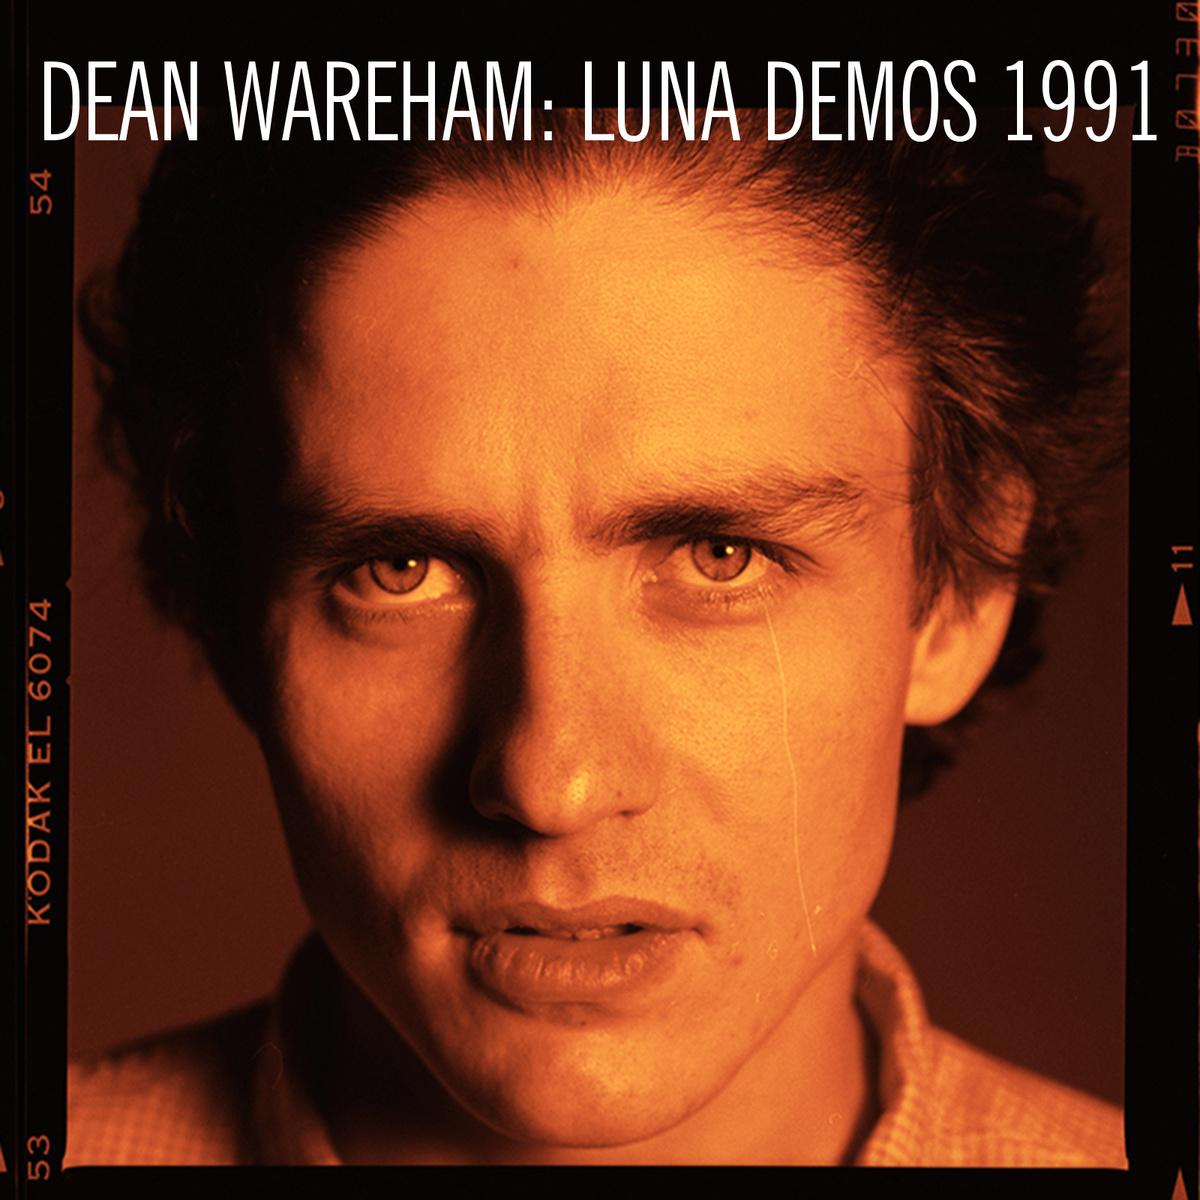 Dean Wareham Posts Luna Rarities To Help Ailing A&R Legend Terry Tolkin